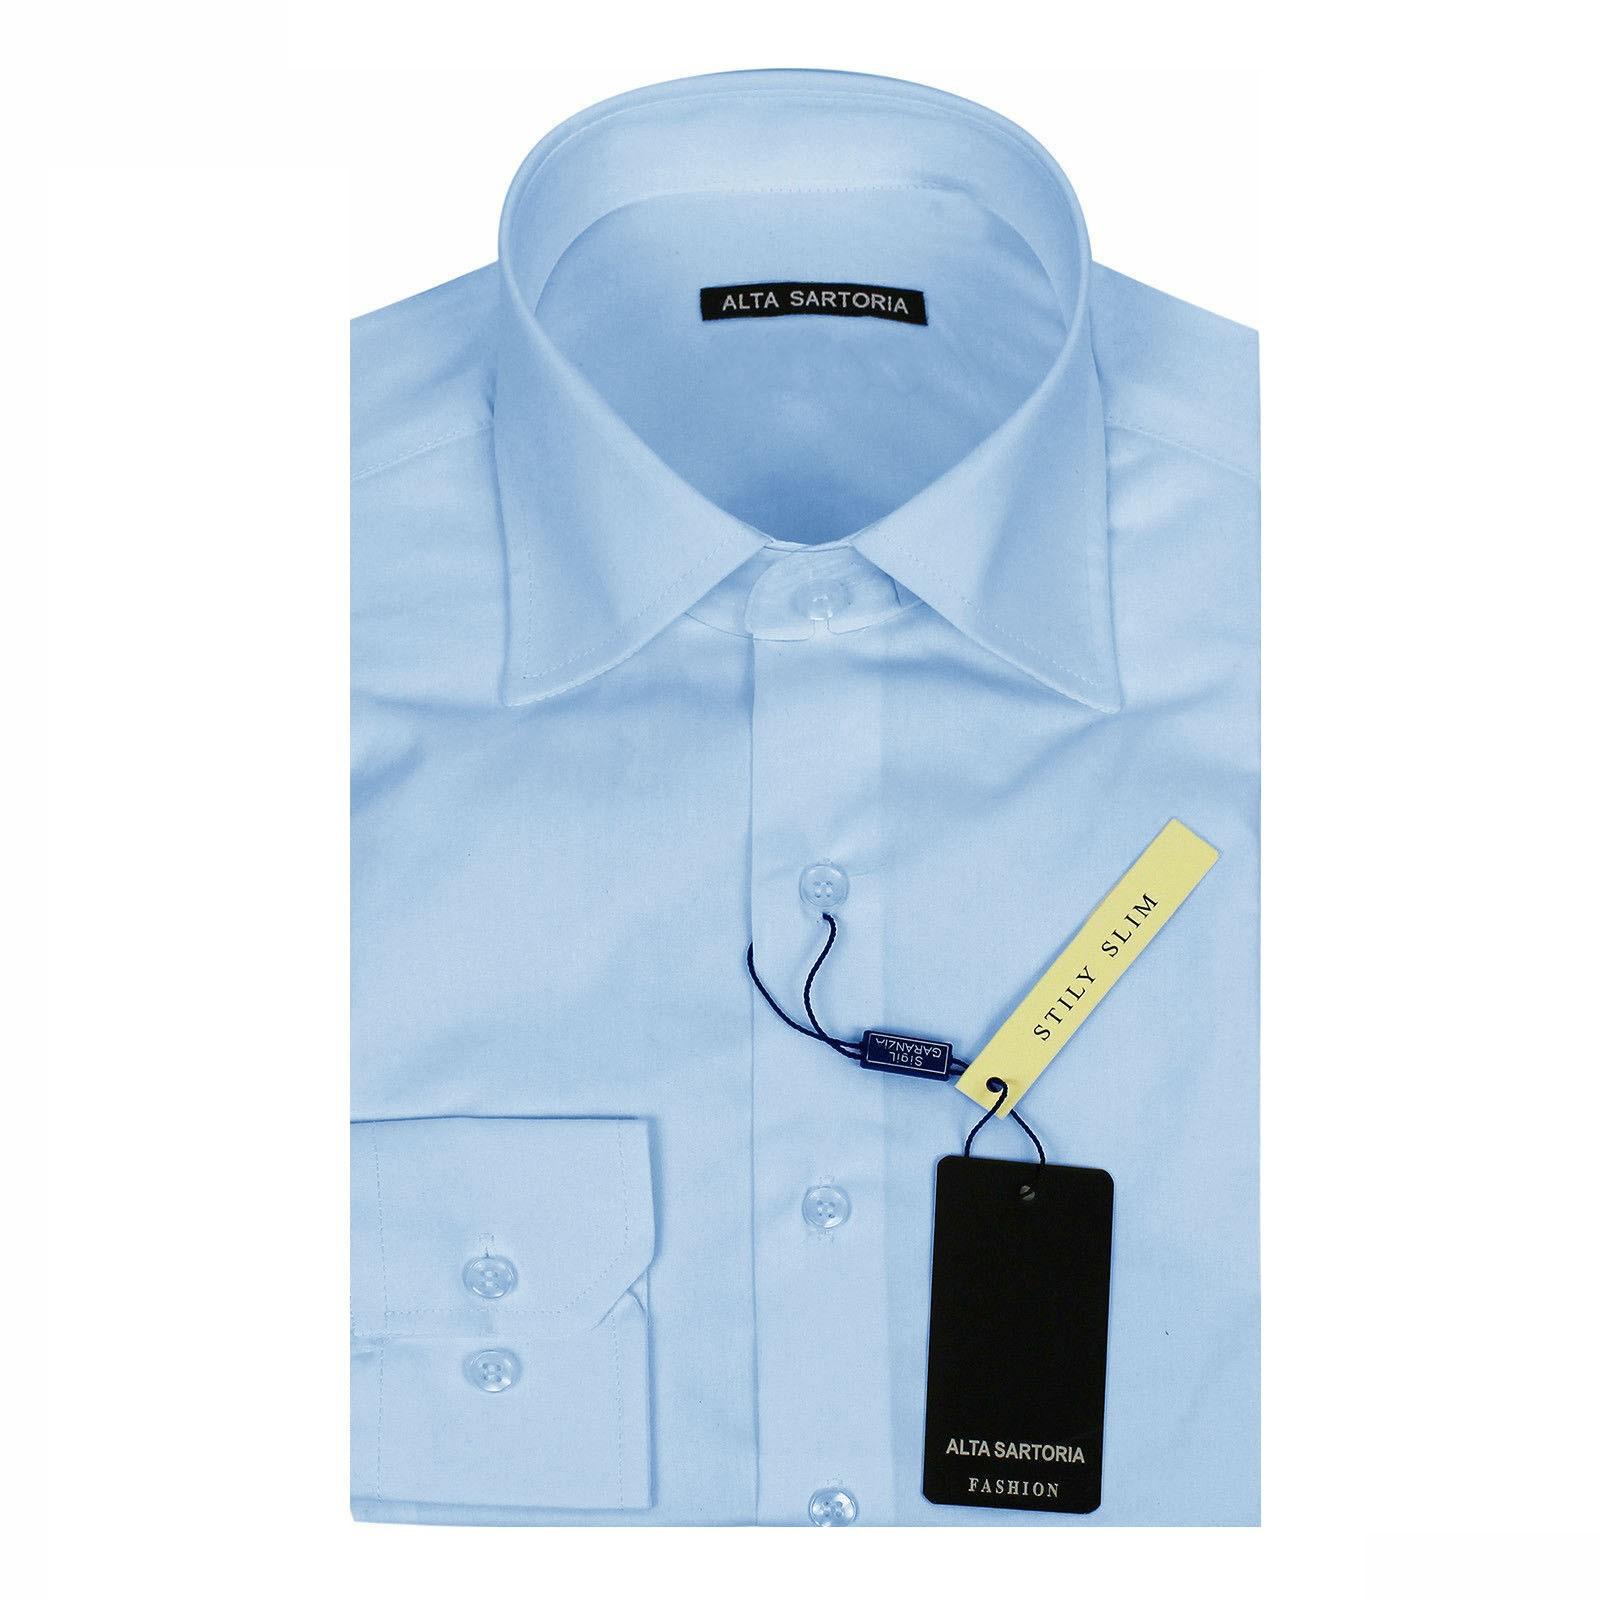 Camicia-Uomo-Celeste-Bianca-Slim-Fit-Manica-Lunga-Sartoriale-Cotone-TG-S-7XL miniatura 21